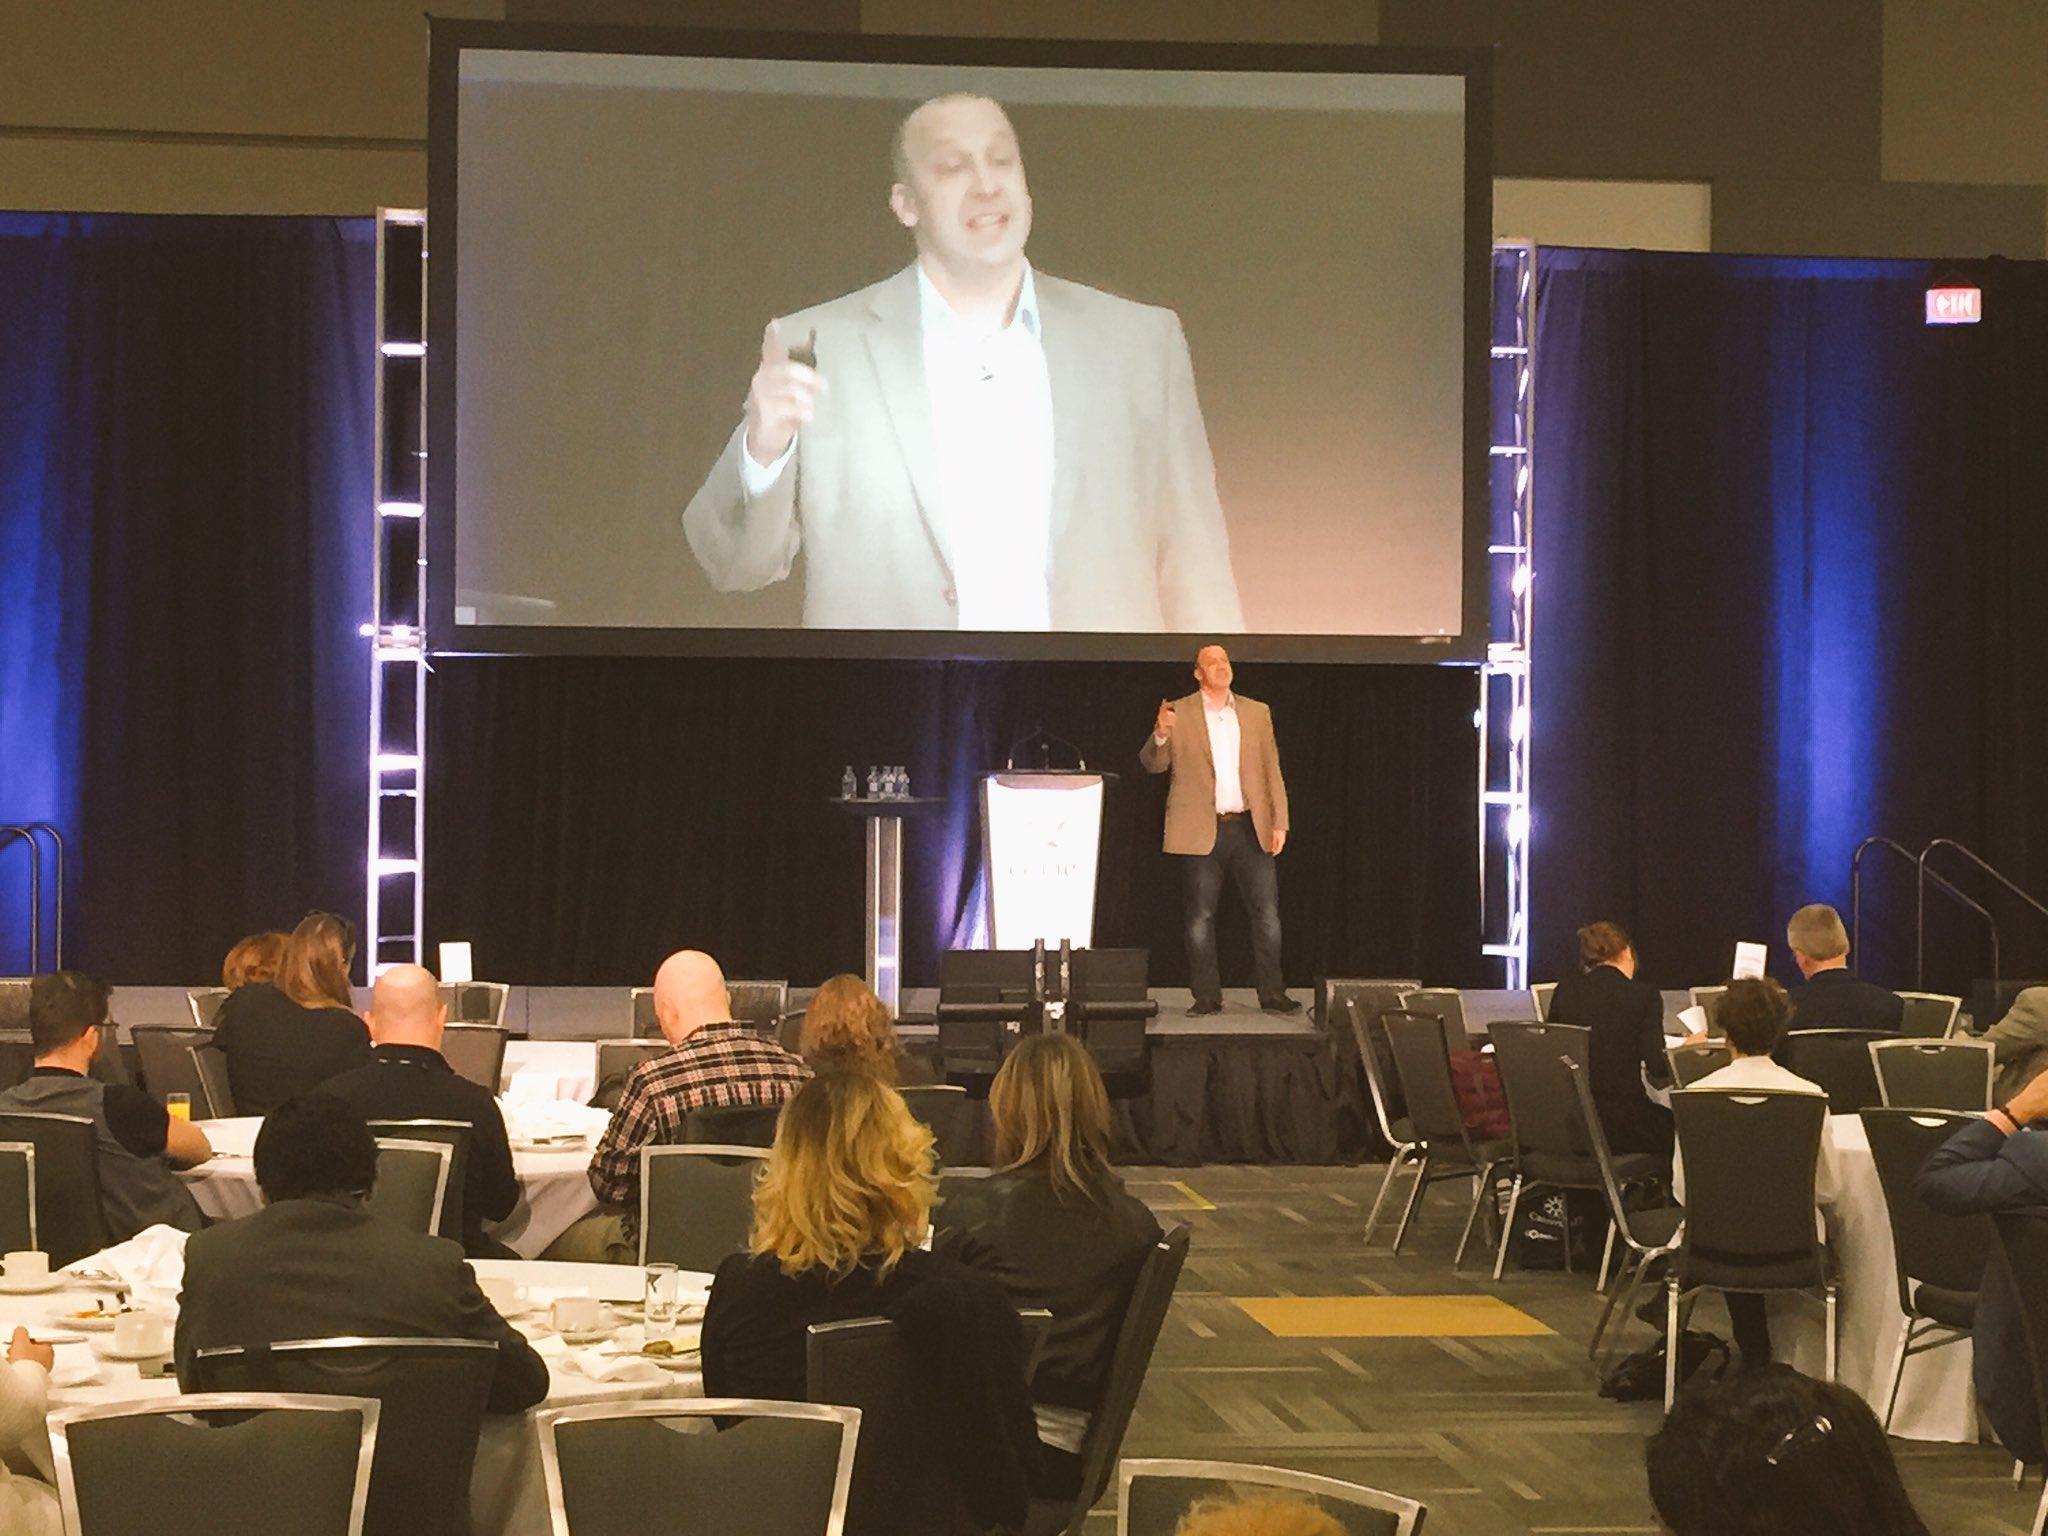 @UQAM professor Louis Cournoyer discusses good career decisions. @ceric_ca @CounsellingFdn @cannexus #cannexus17 https://t.co/ZZZBMe9Jri